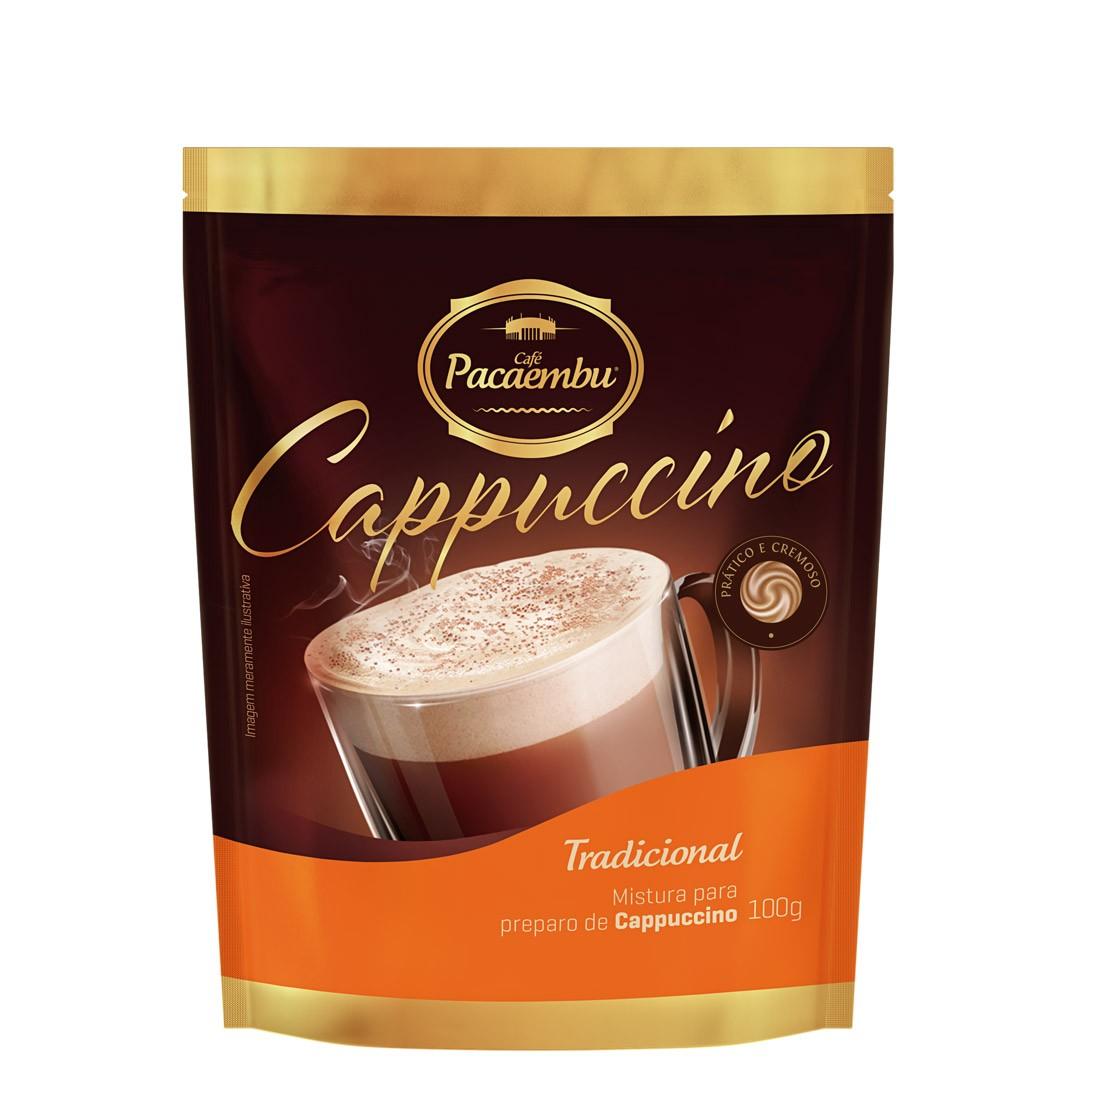 Cappuccino Solúvel Tradiconal Pacaembu Sachês 100g - 24 un